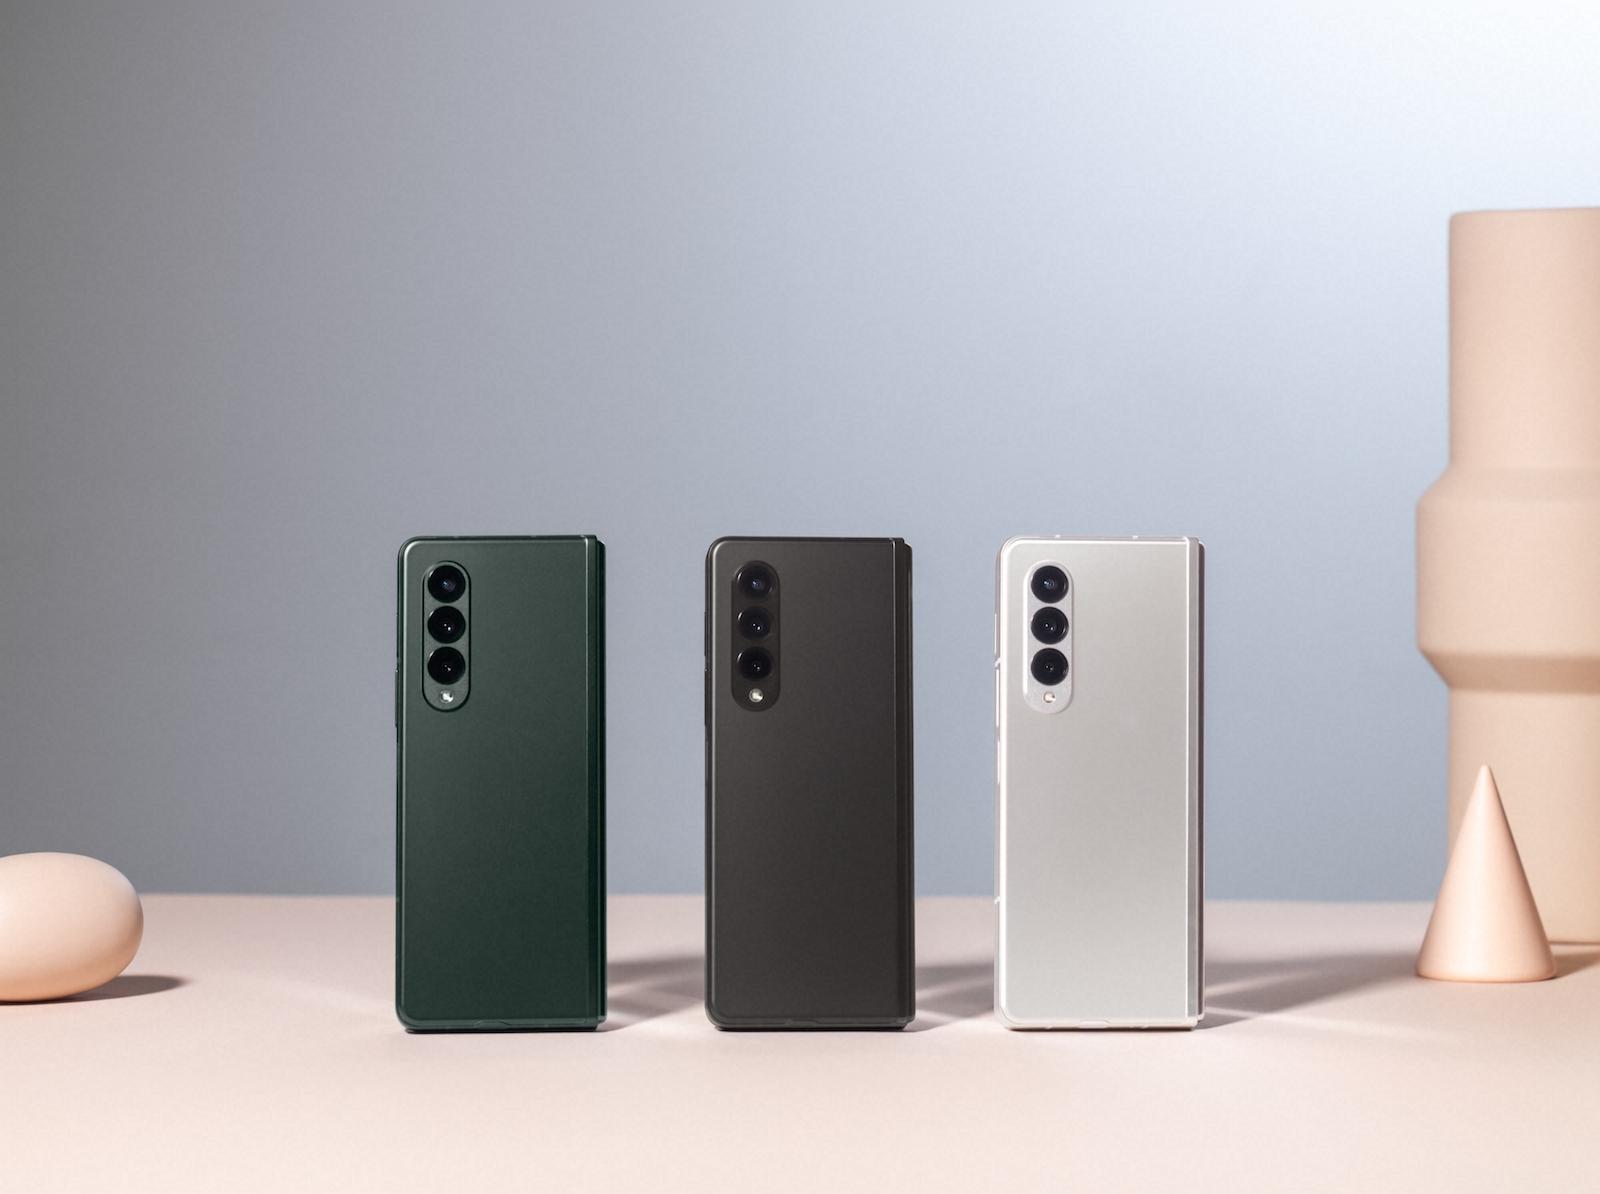 Samsung Galaxy Z Fold 3 in Phantom Green, Phantom Black and Phantom Silver